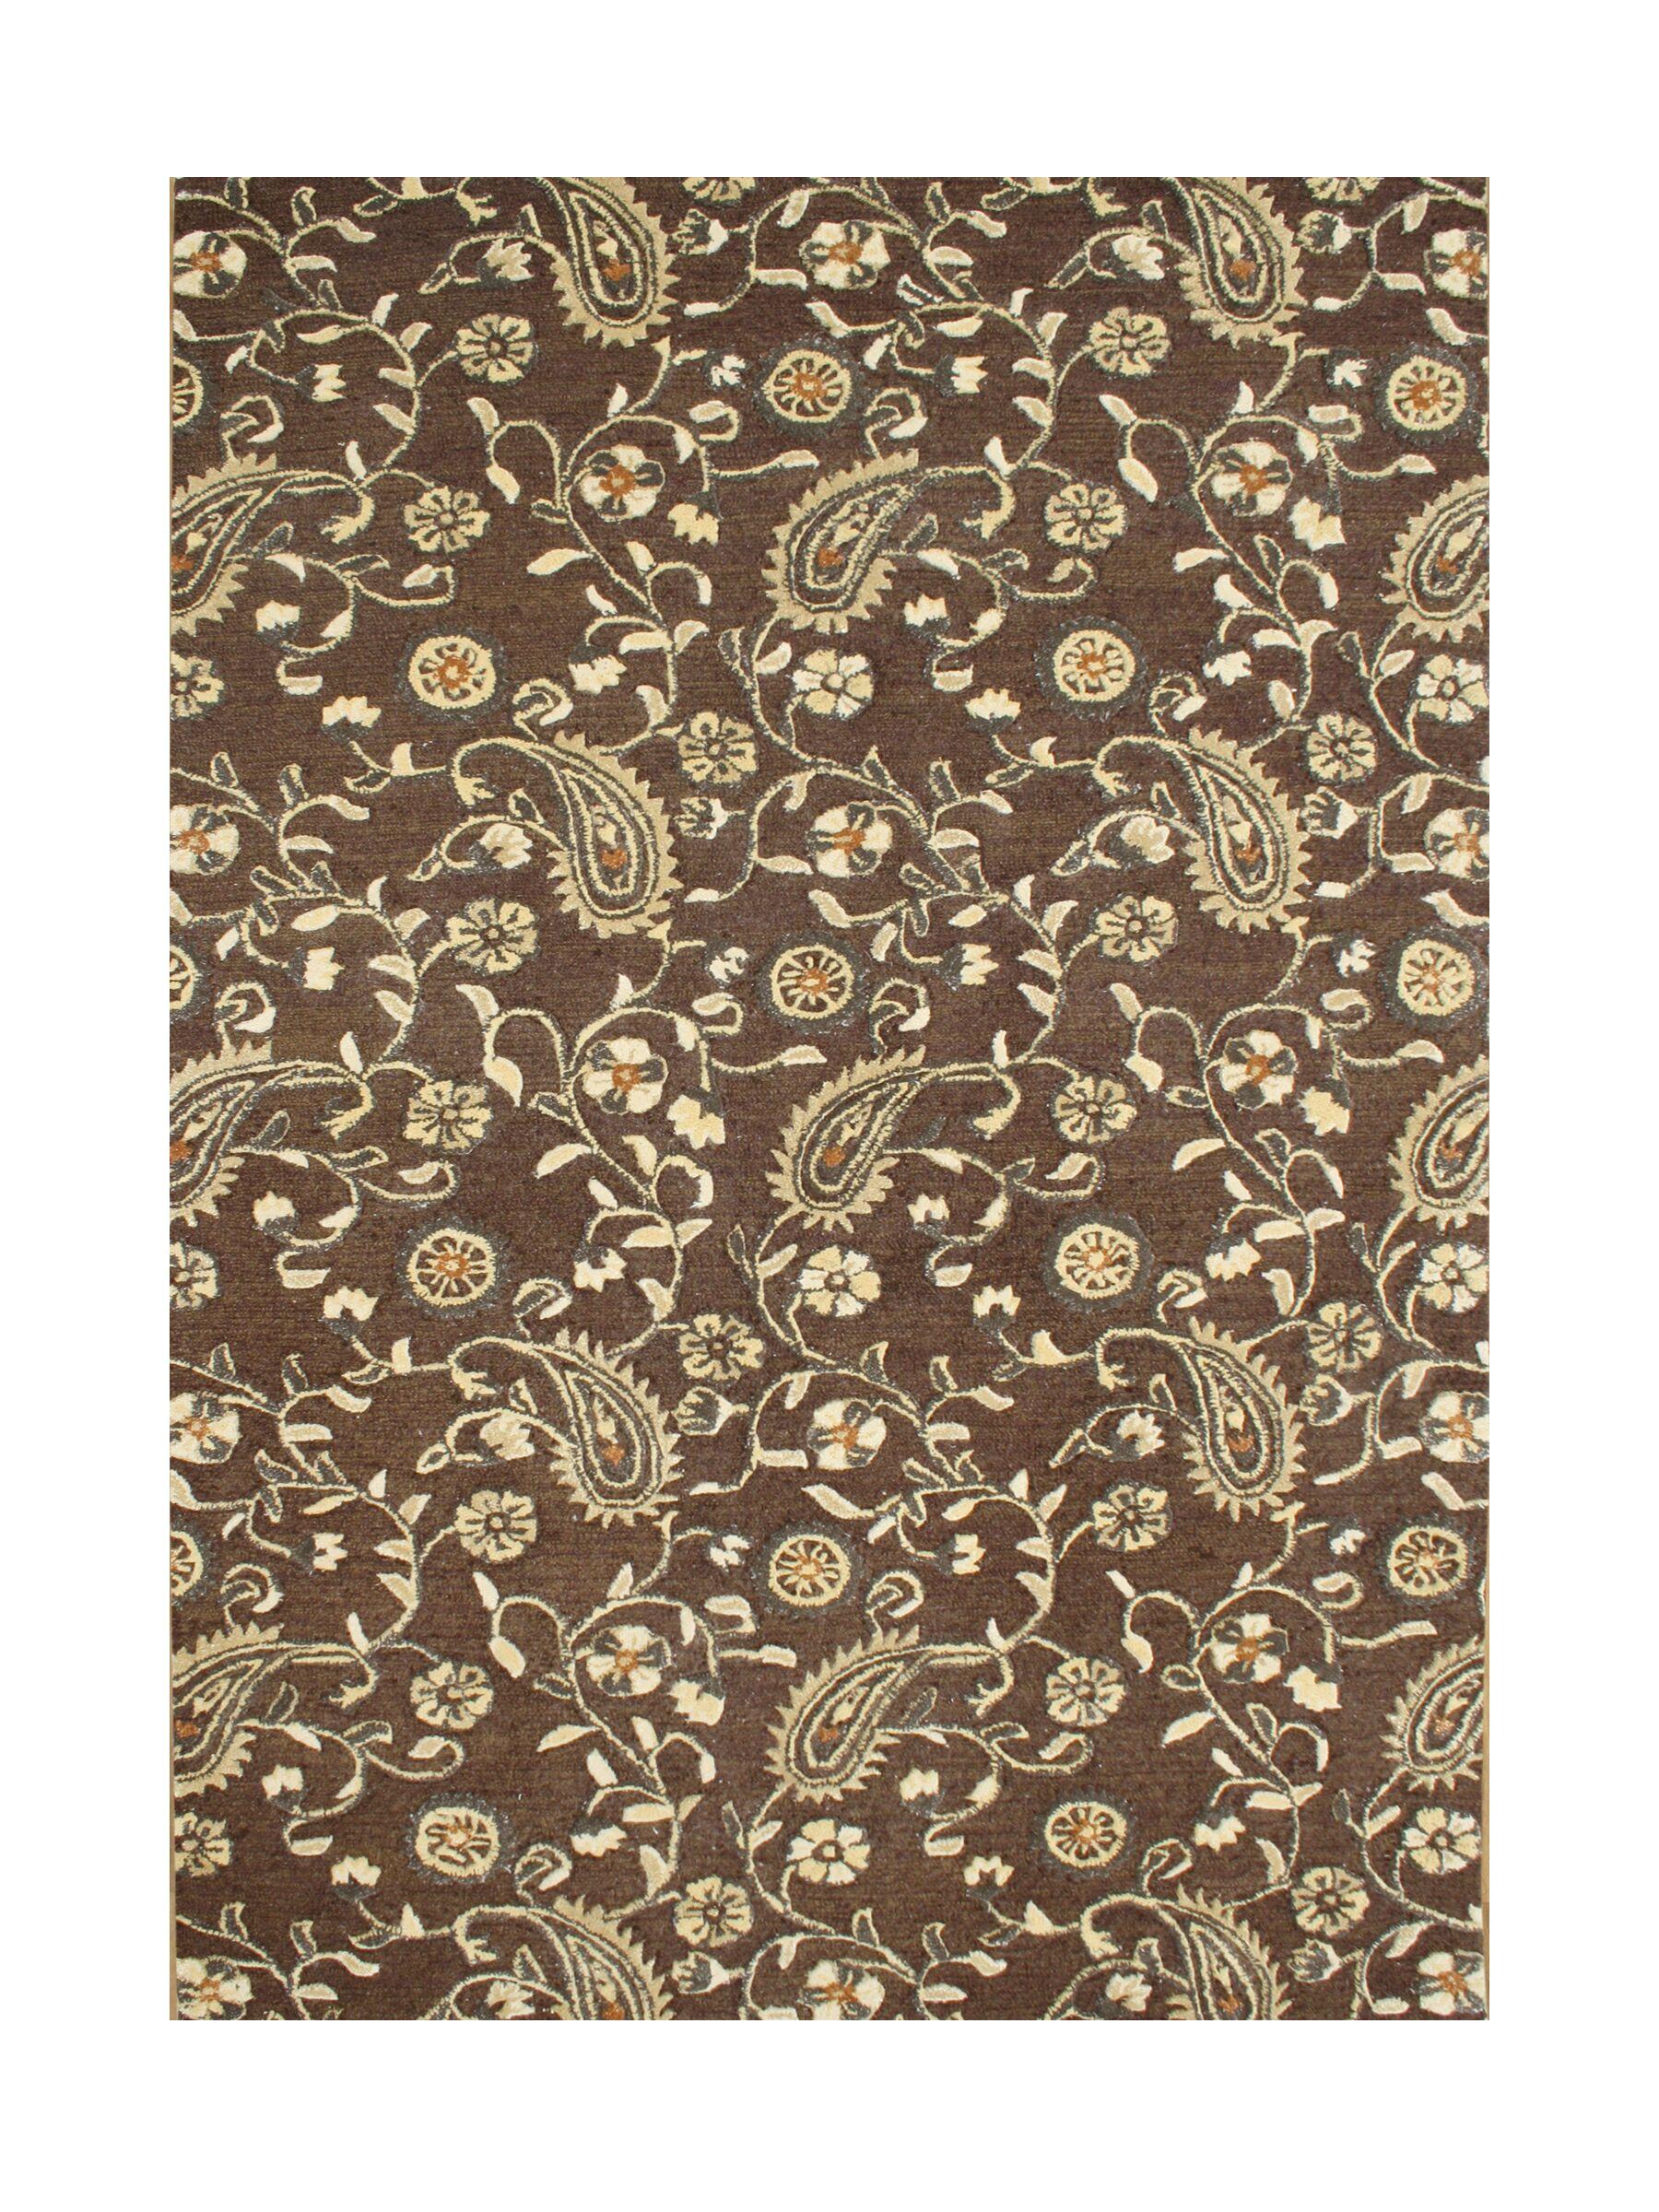 Heathcote Gray Hand-Tufted Tobacco Brown Area Rug Rug Size: 8' x 10'